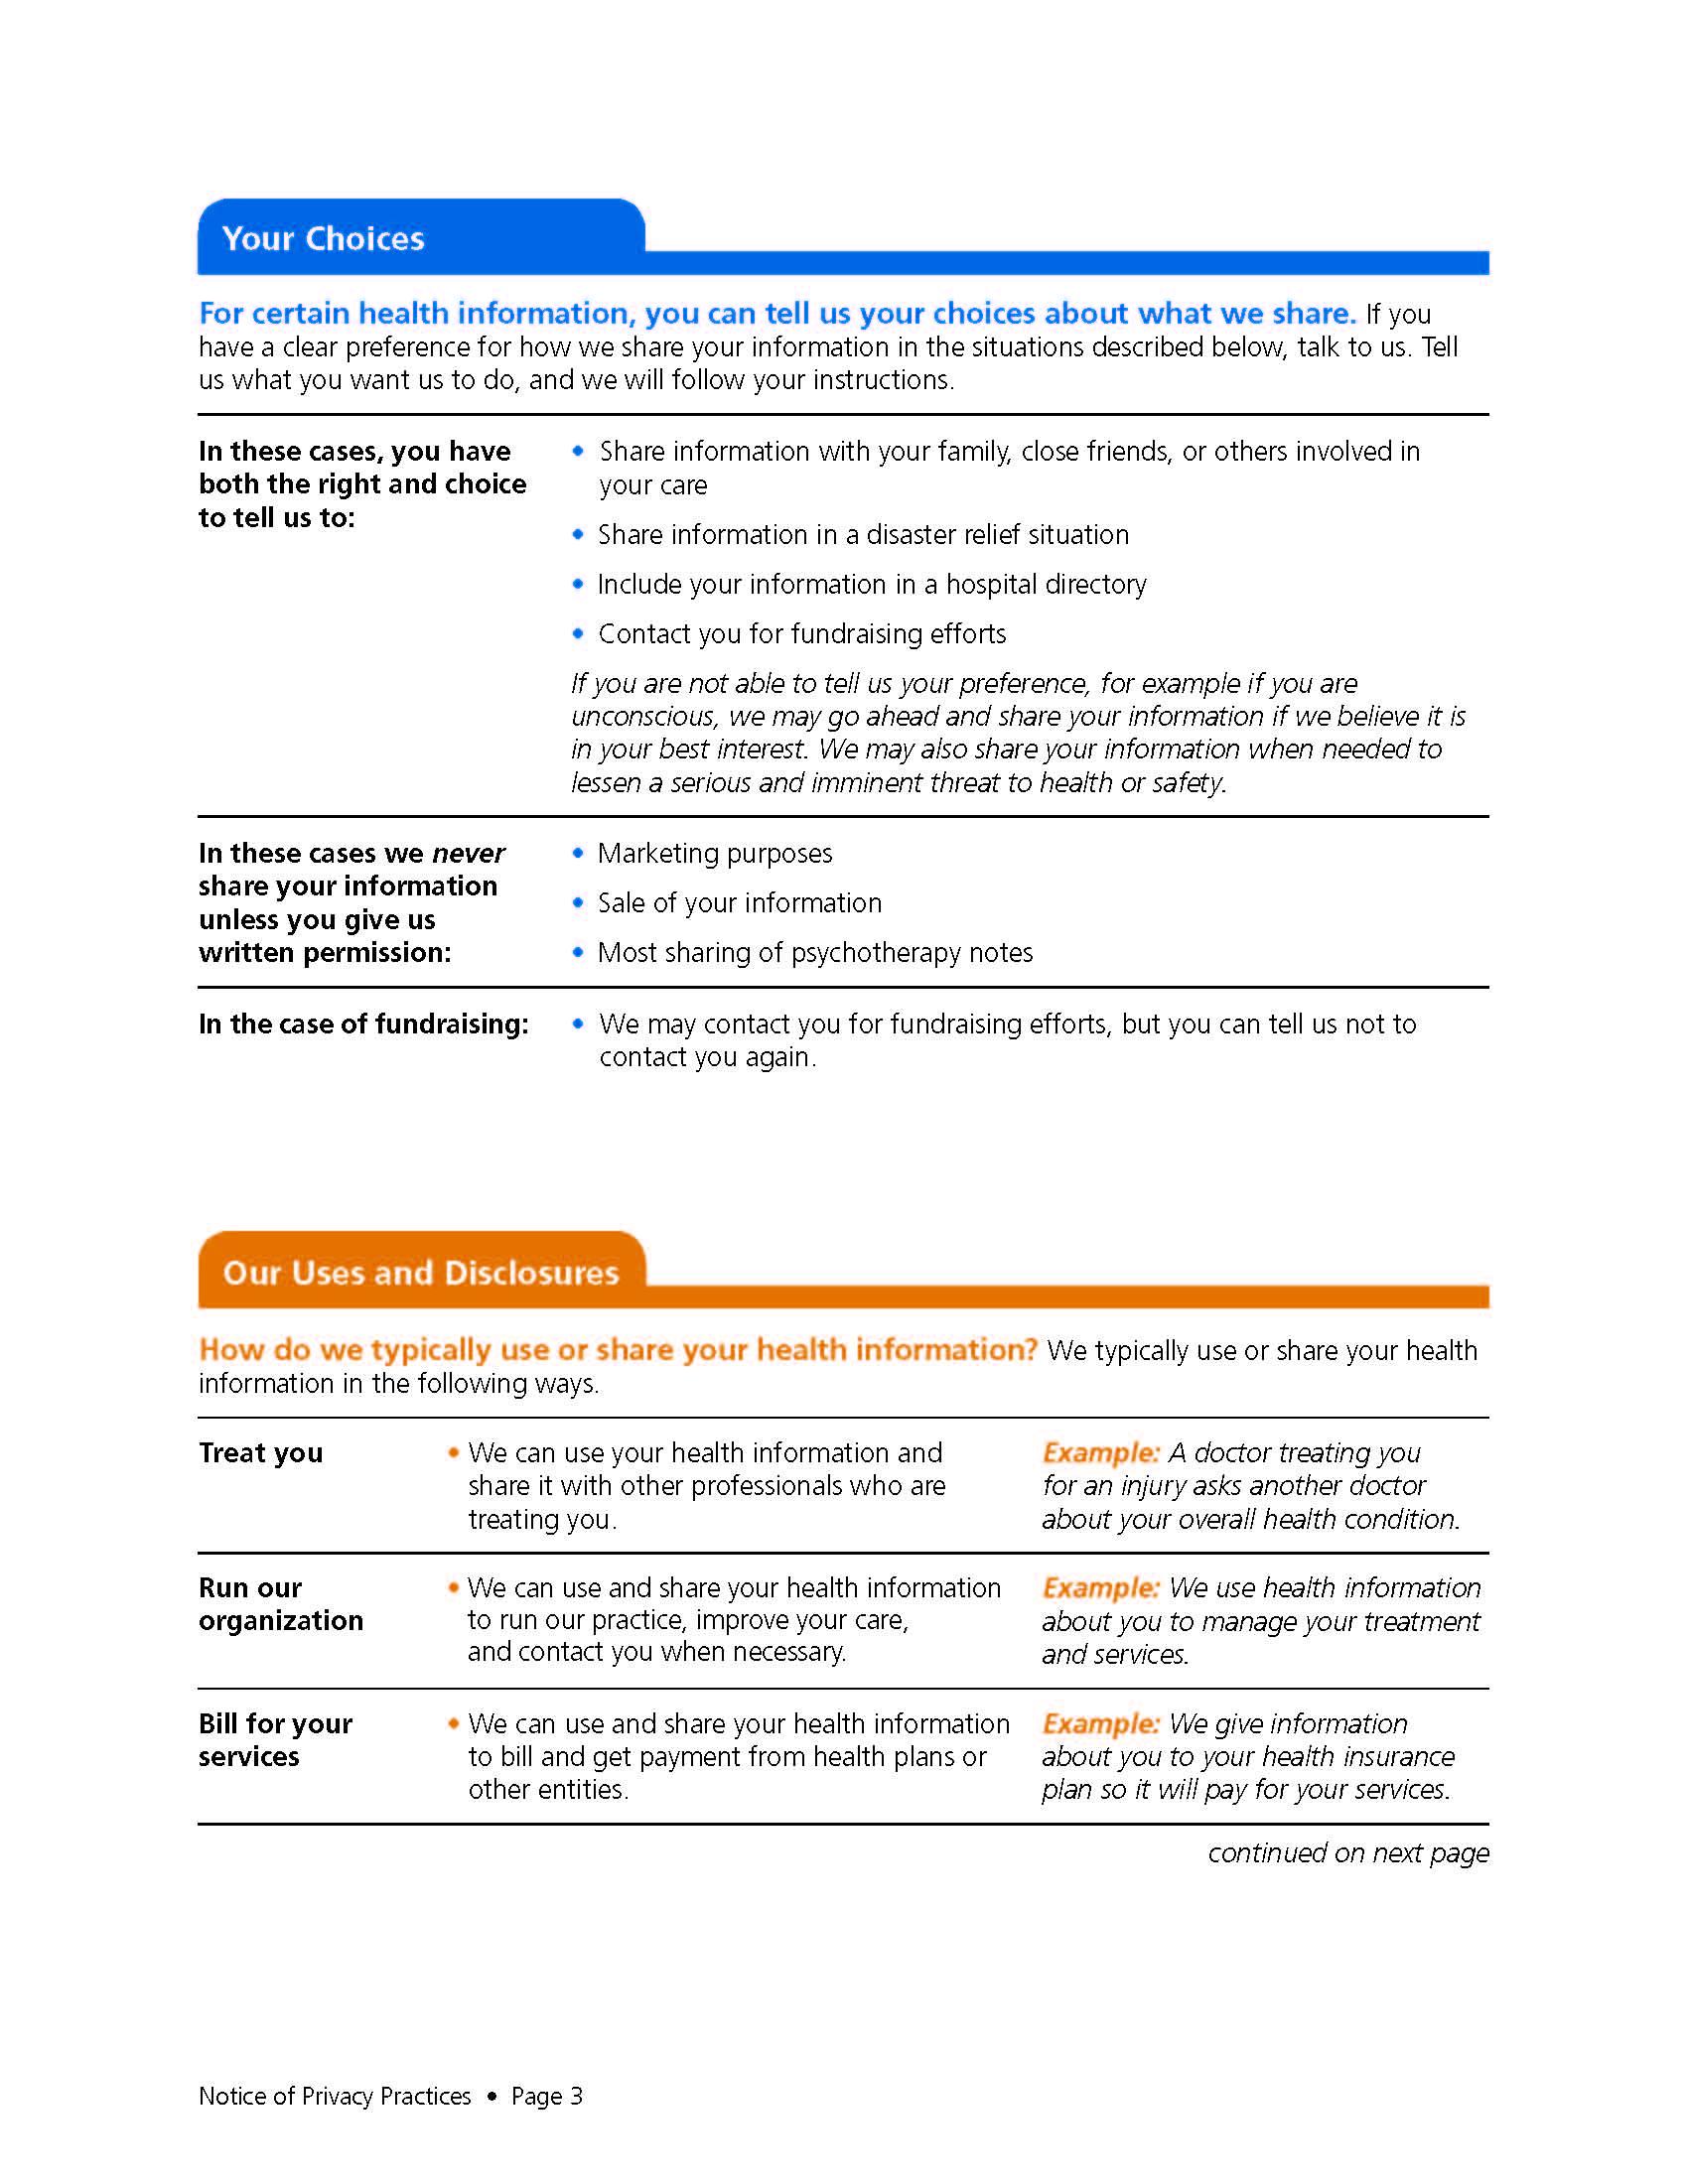 UFAAC HIPAA Doc pg 3